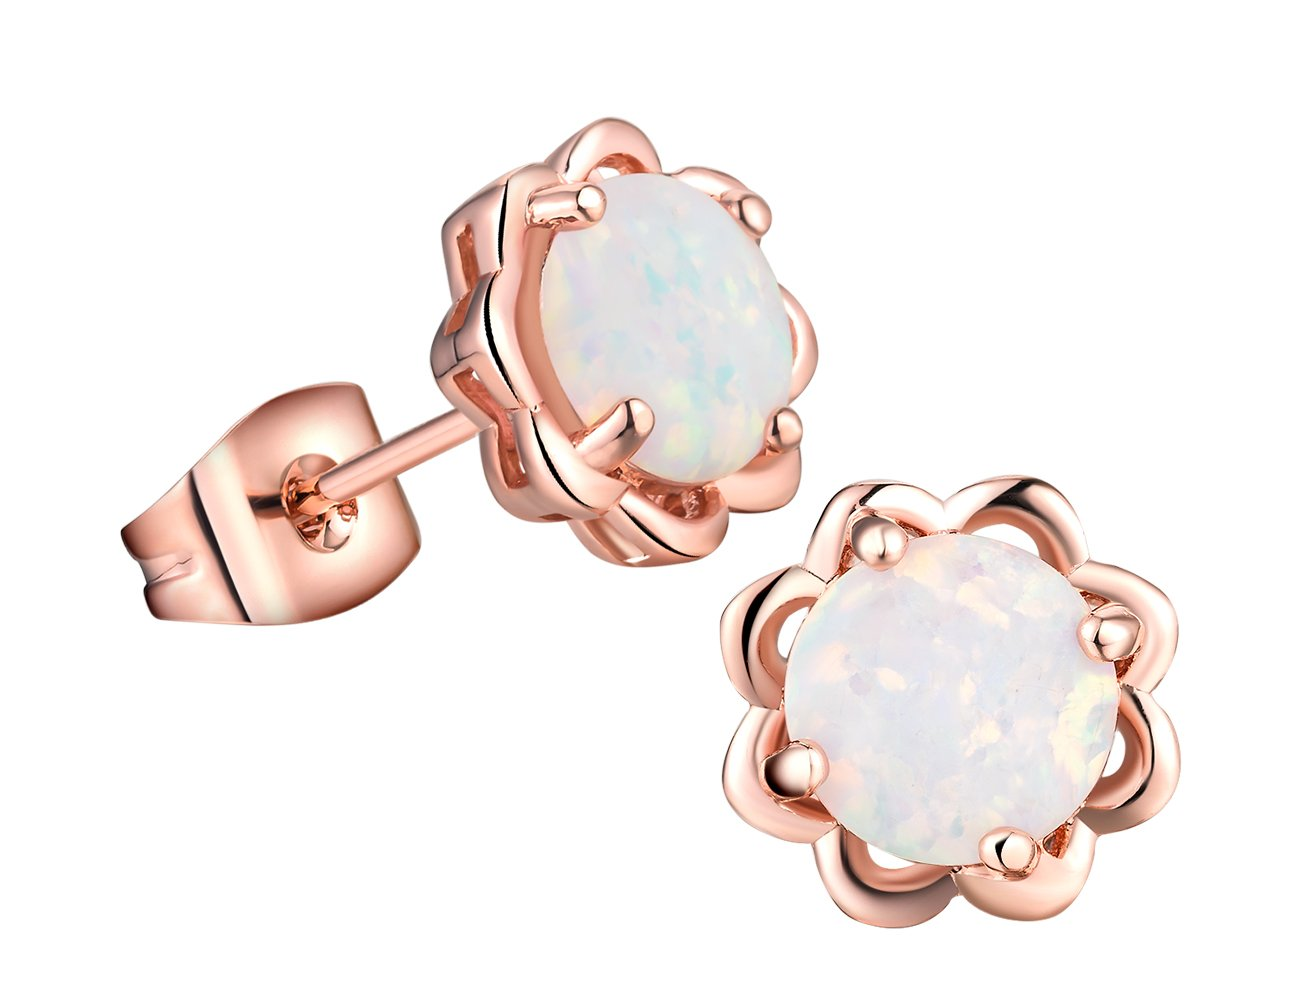 Opal Lotus earrings-18K Rose Gold Plated 6mm Round White Opal Stud Earrings For Women Girls